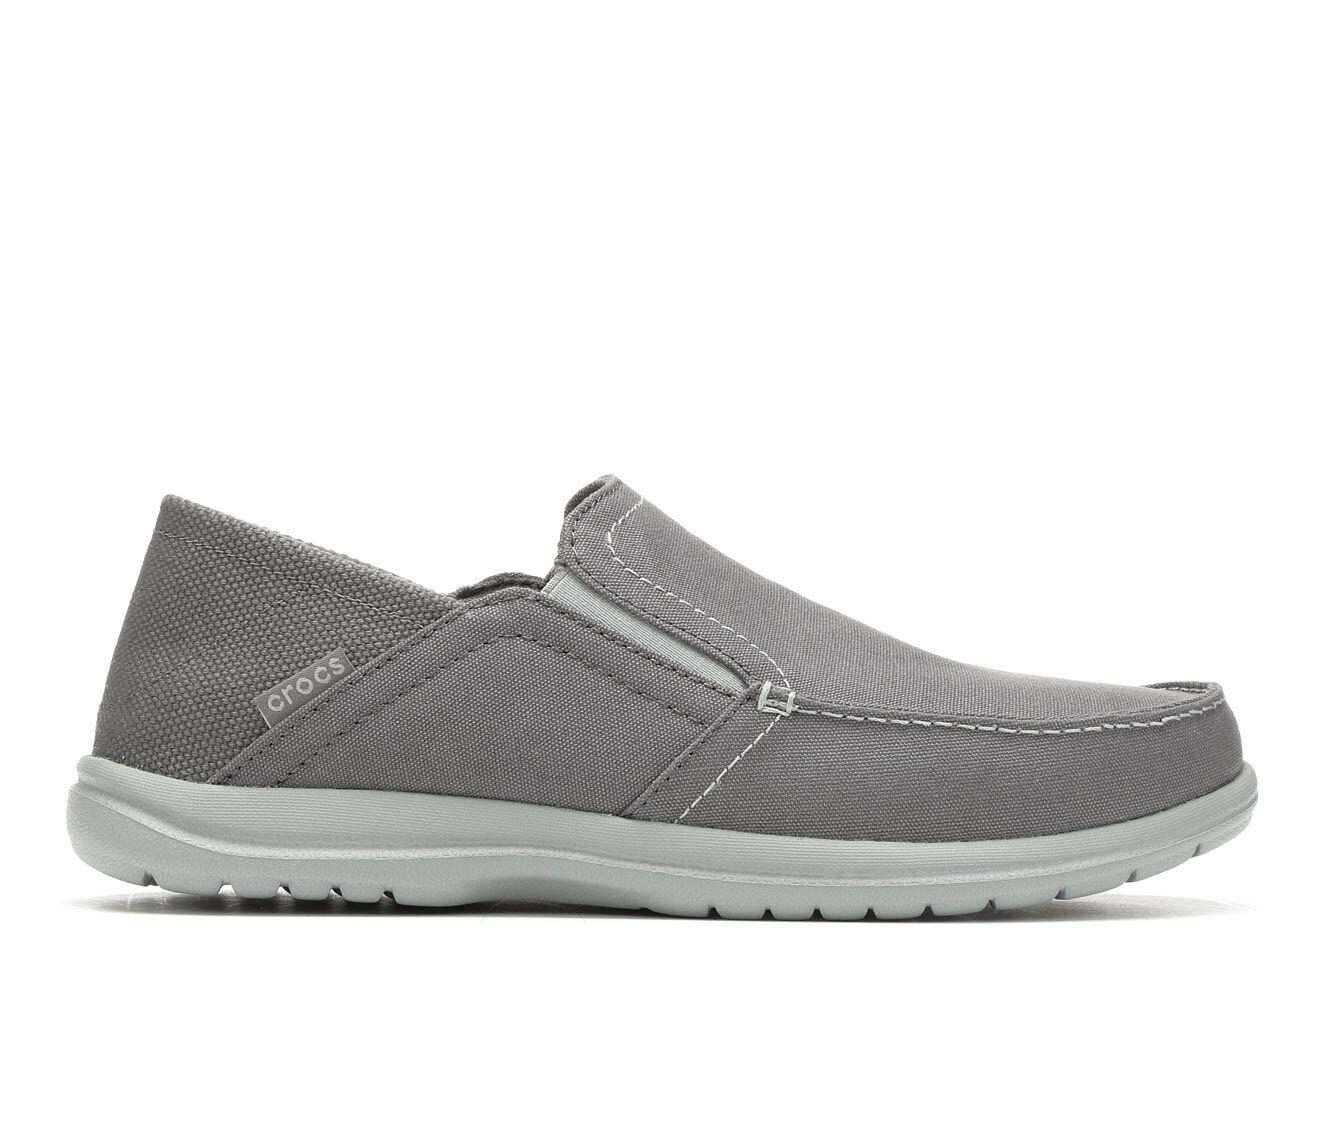 Men's Crocs Santa Cruz Convertible Slip On Loafer Lt Grey/Slate